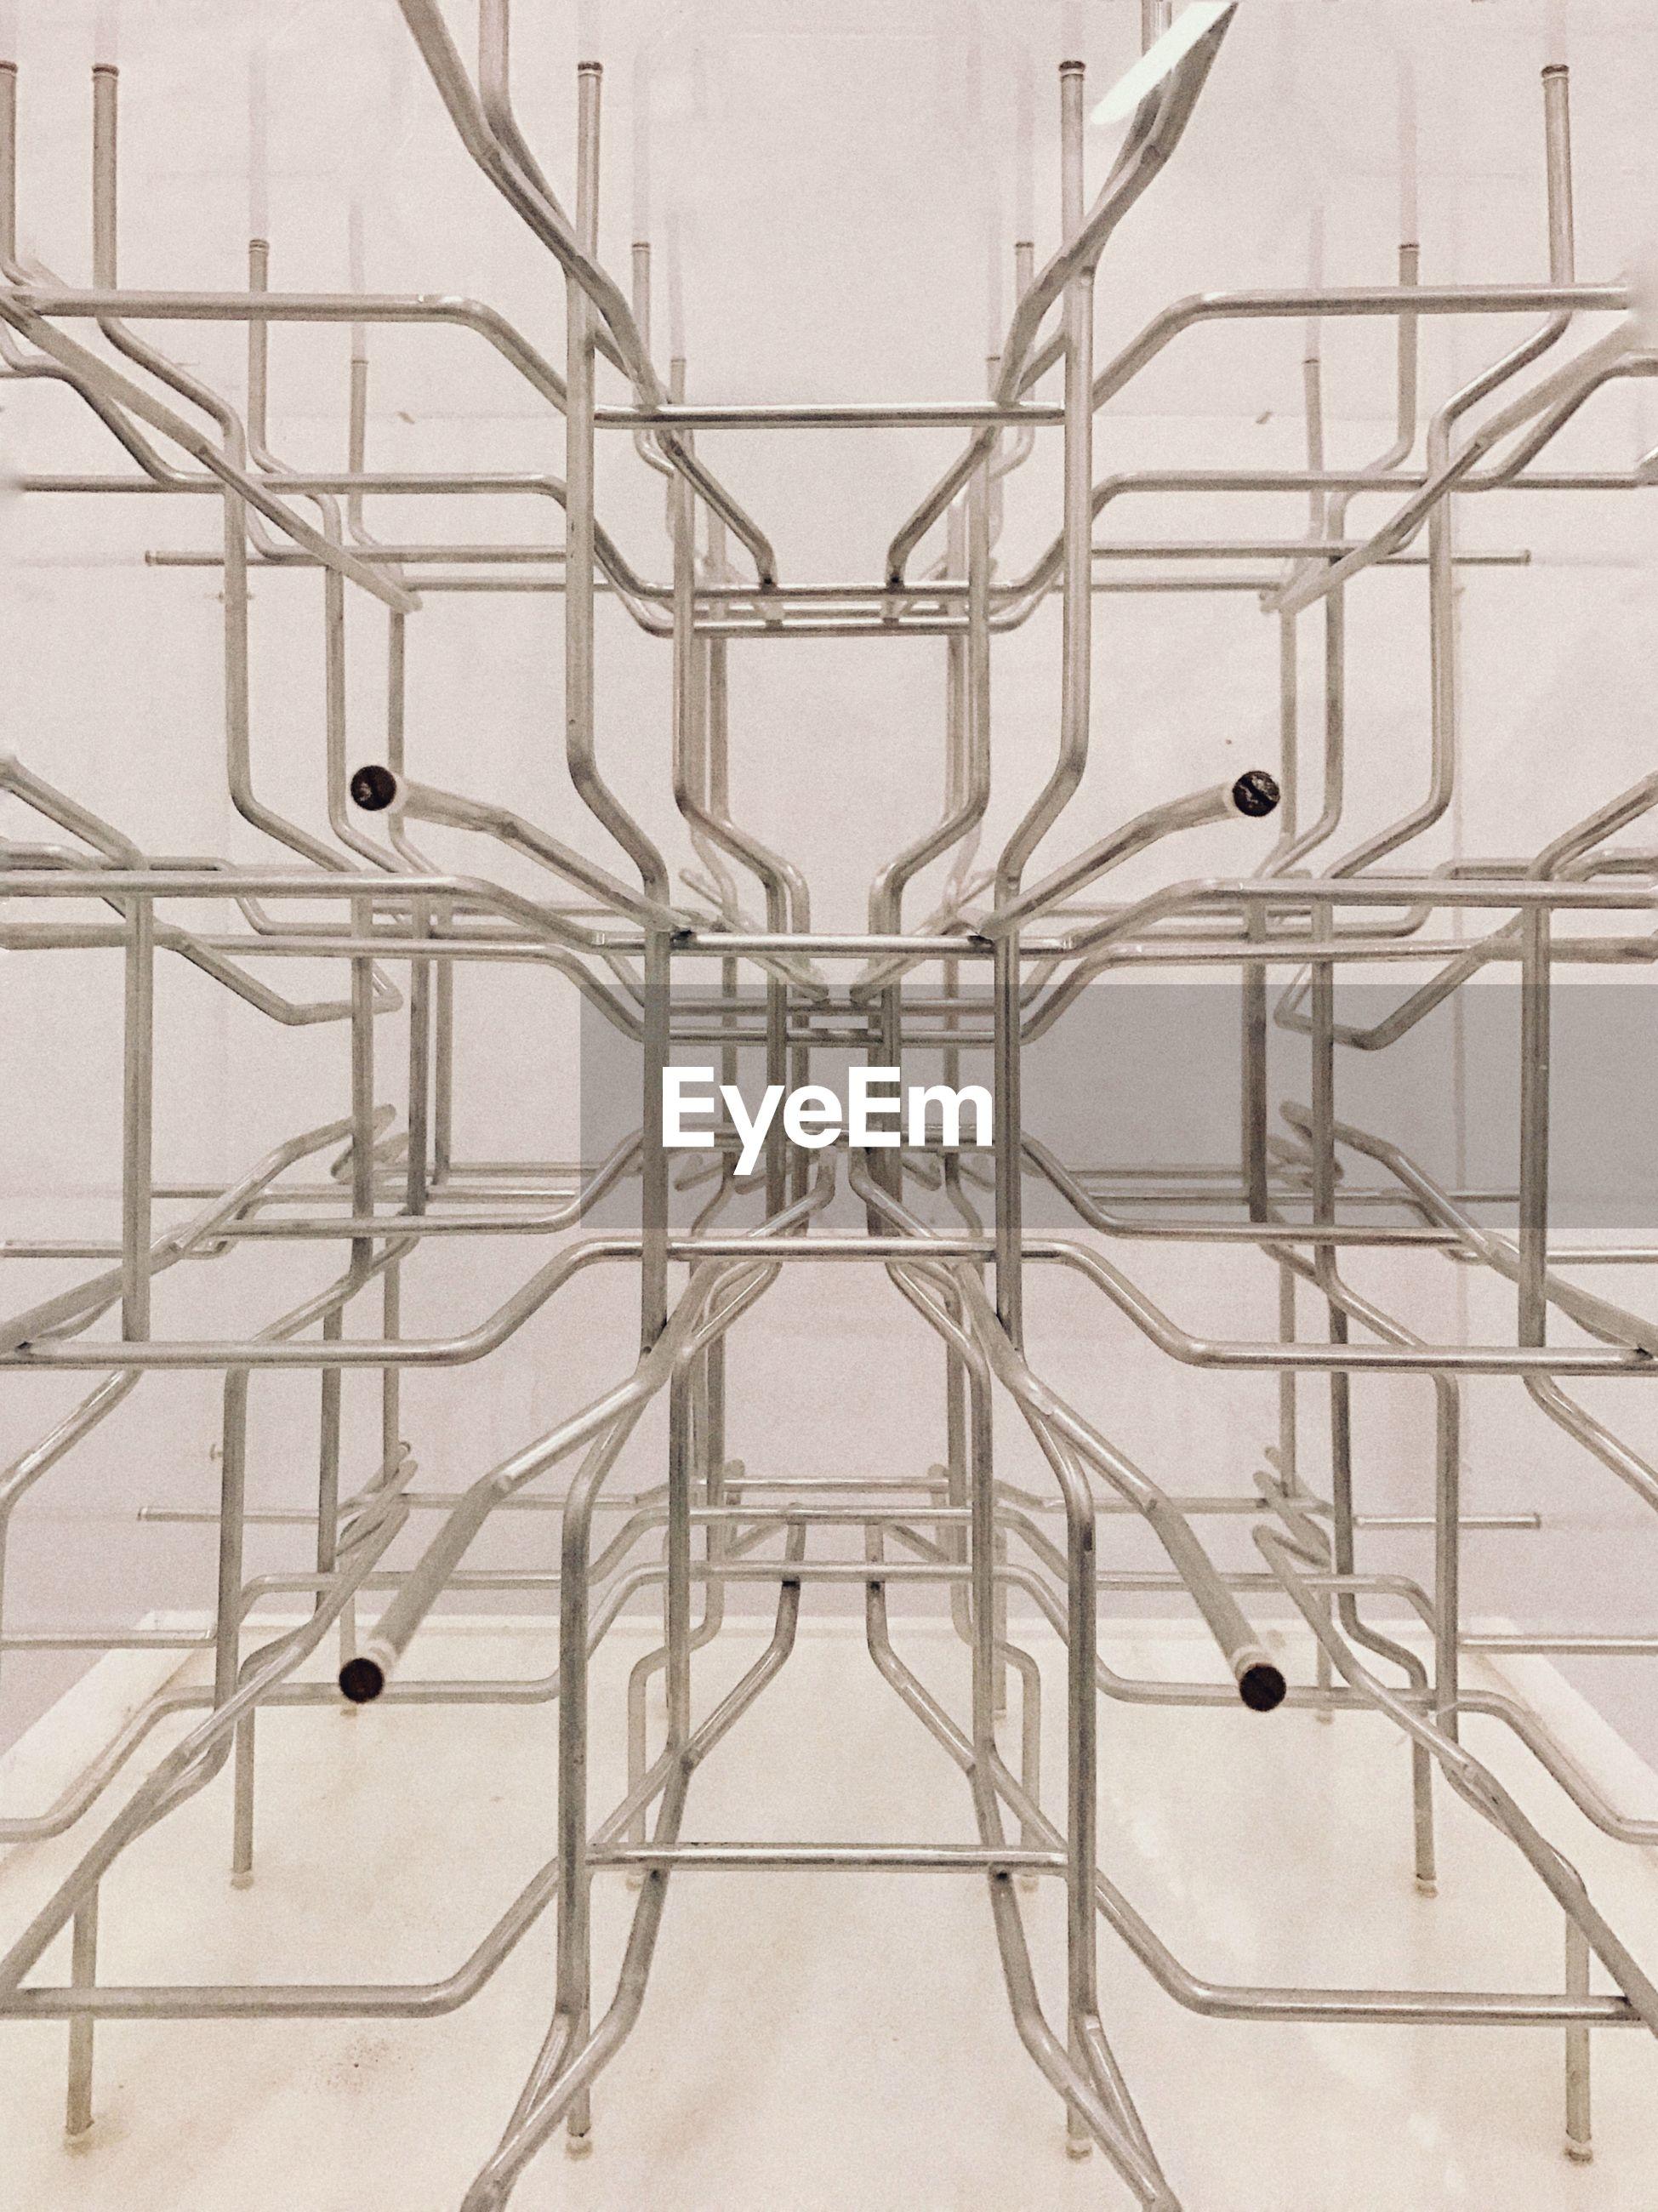 DIRECTLY BELOW SHOT OF MODERN GLASS WALL